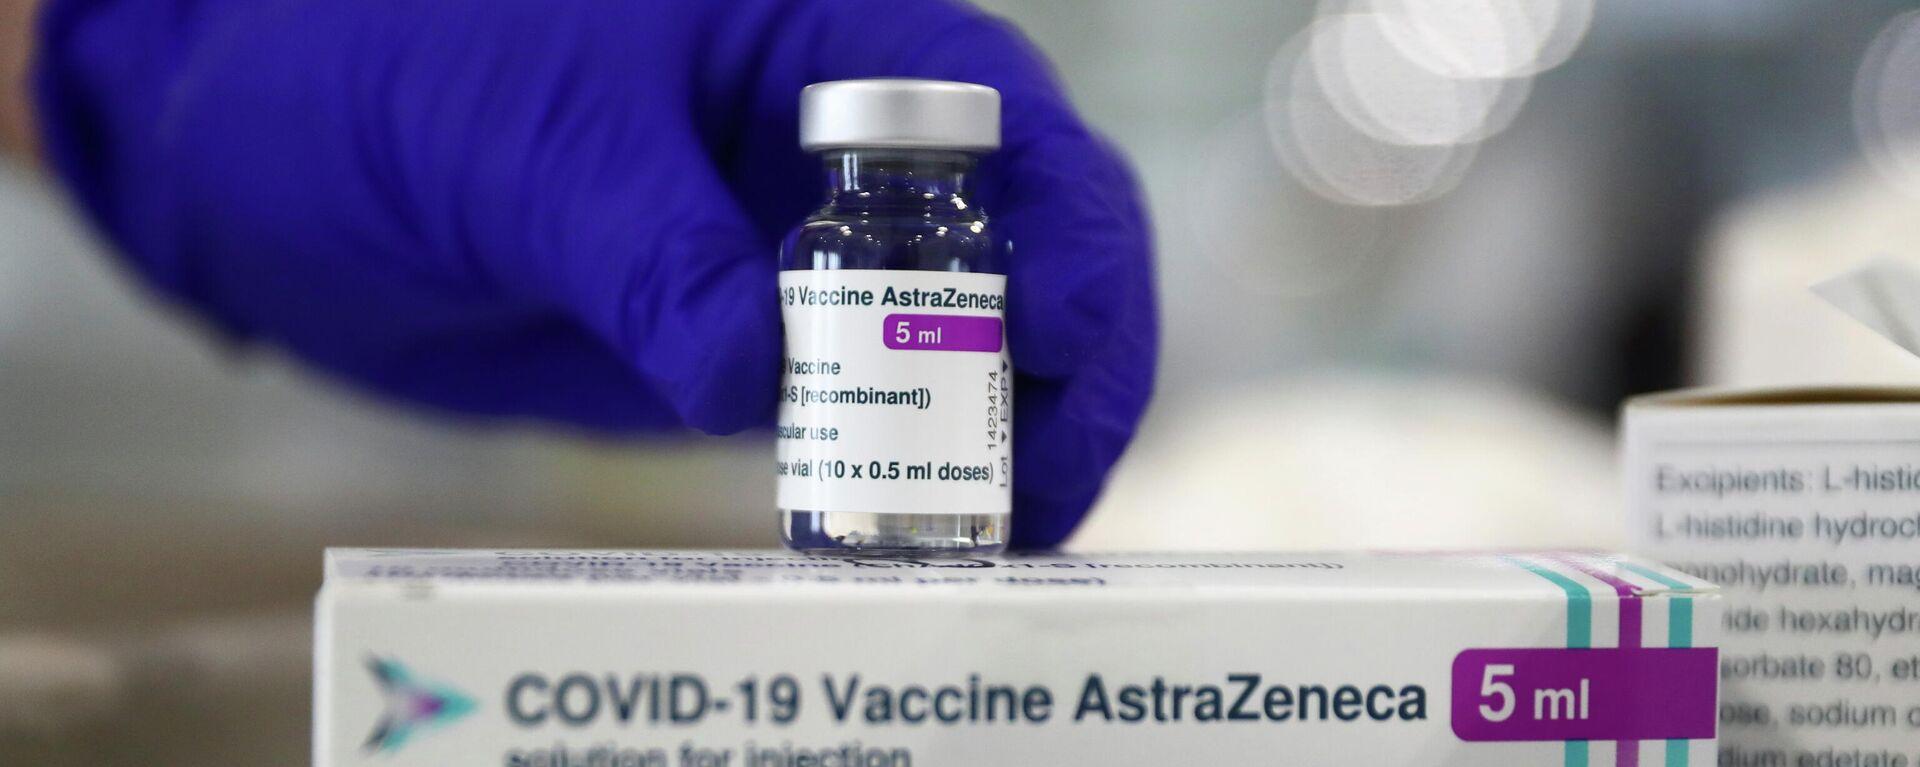 Vacuna contra el coronavirus AstraZeneca en Madrid, España - Sputnik Mundo, 1920, 23.04.2021